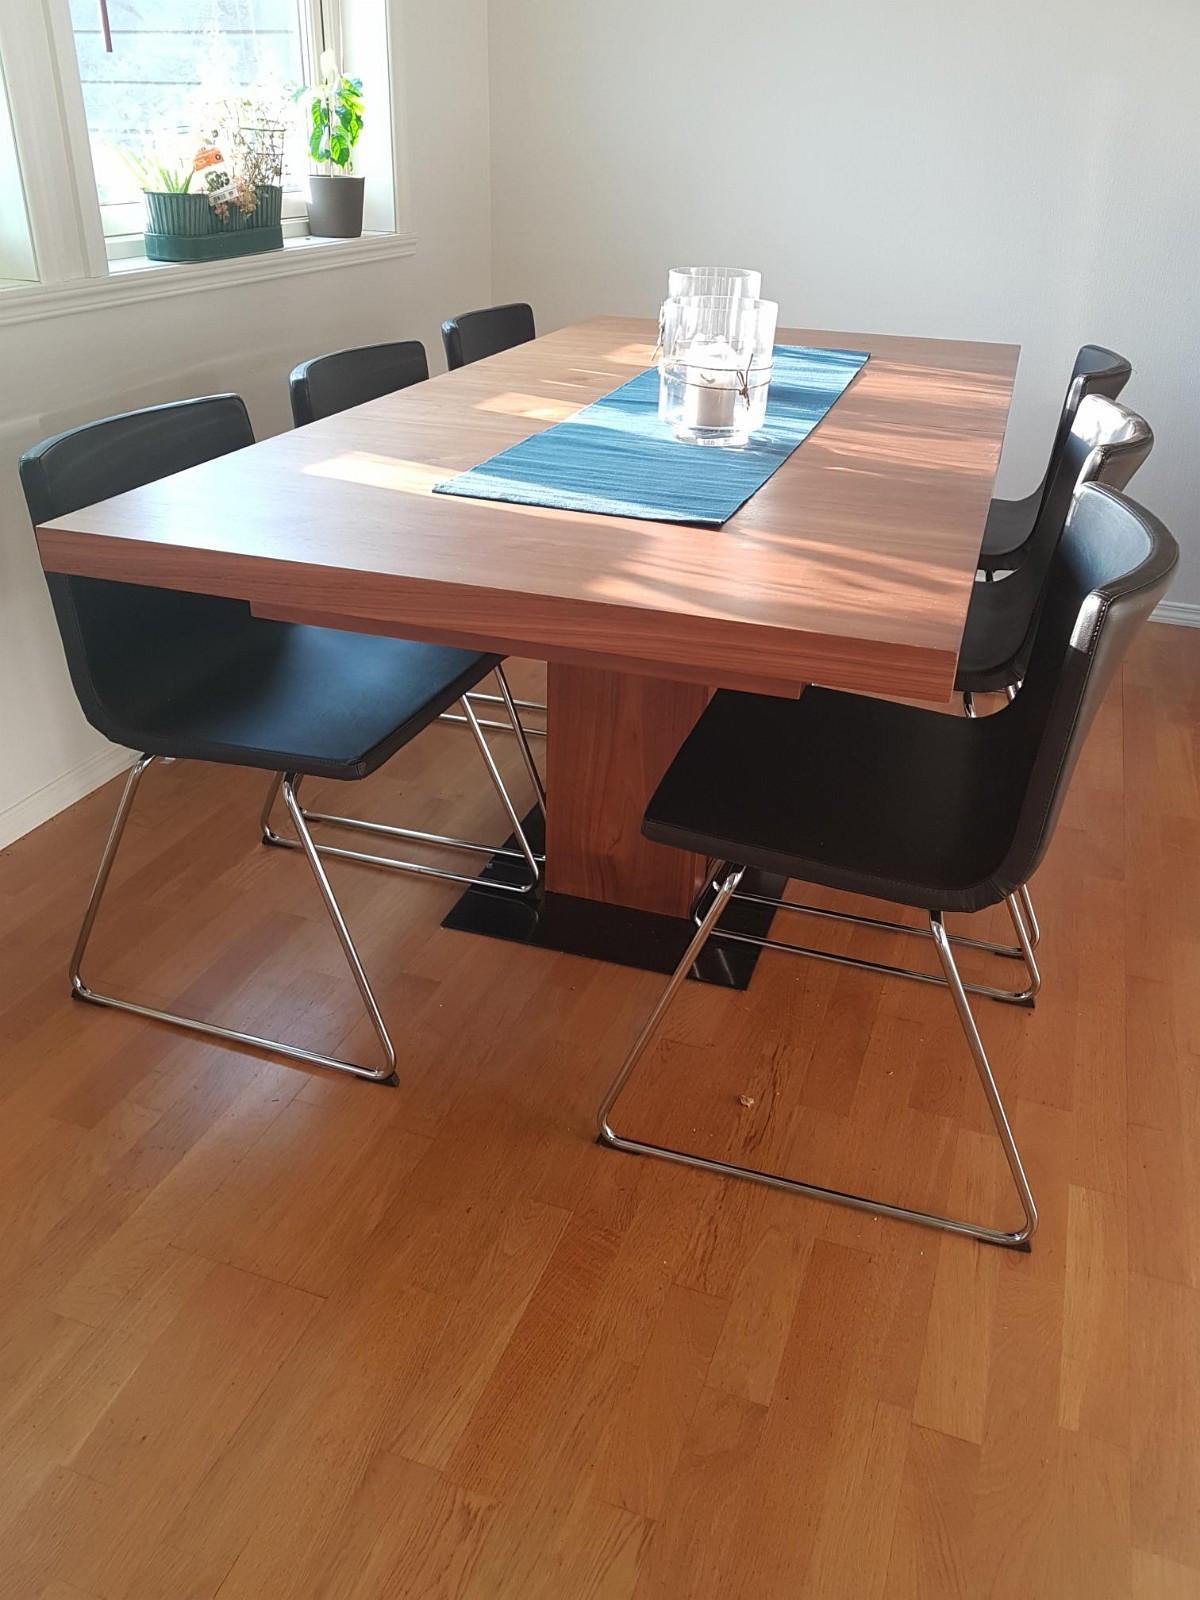 Brooklyn Spisebord - Lindås  - Stort spisebord med illegsplate inni. Par små skader, se bilder. Mål kommer. - Lindås